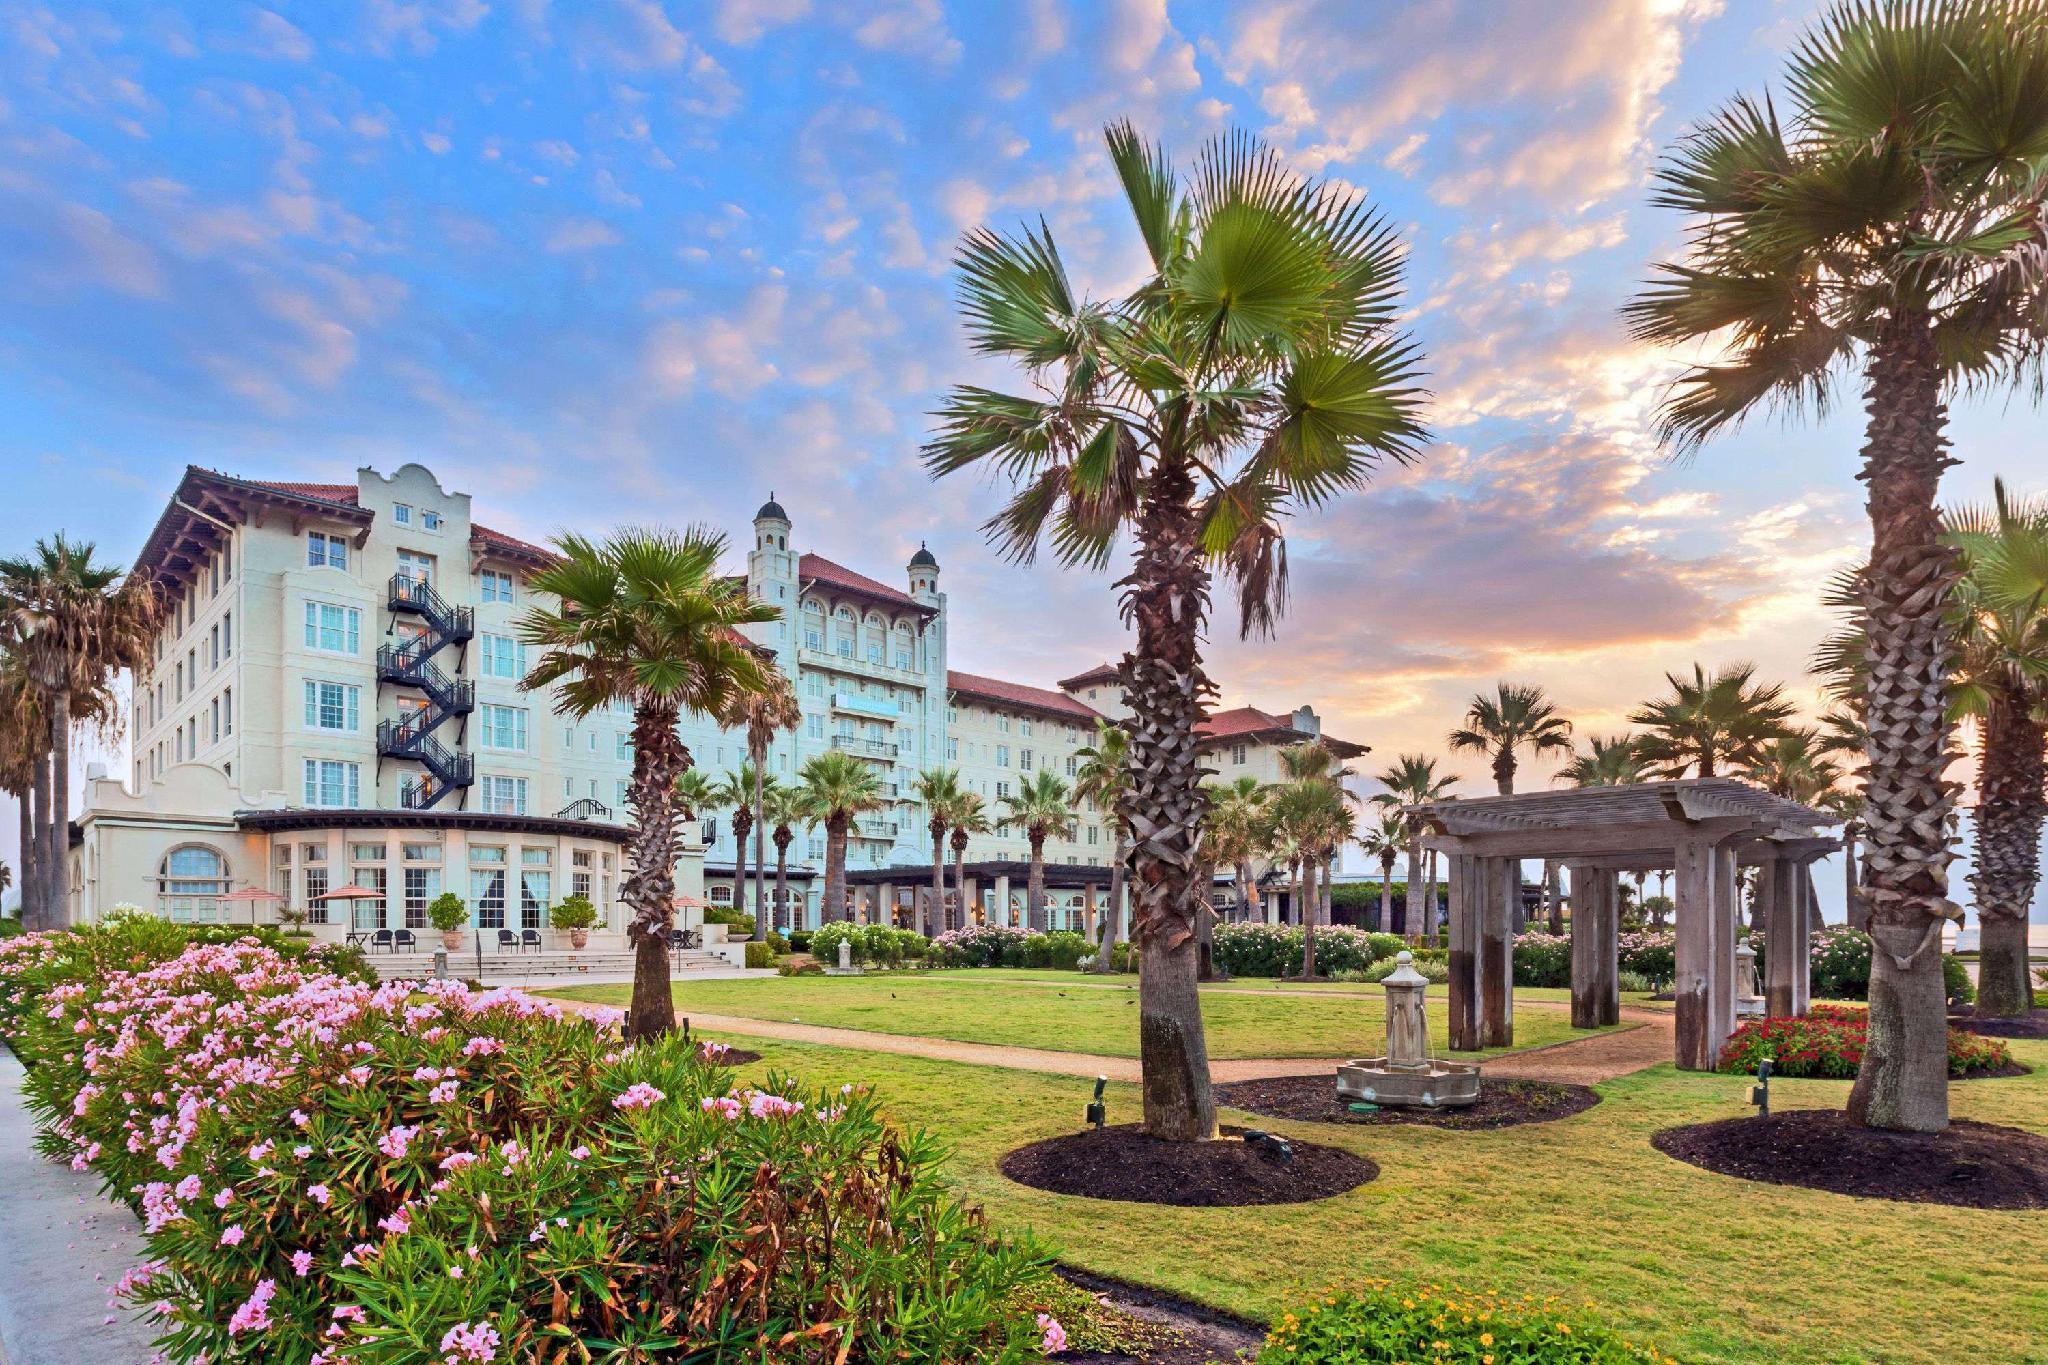 Hotel Galvez And Spa A Wyndham Grand Hotel